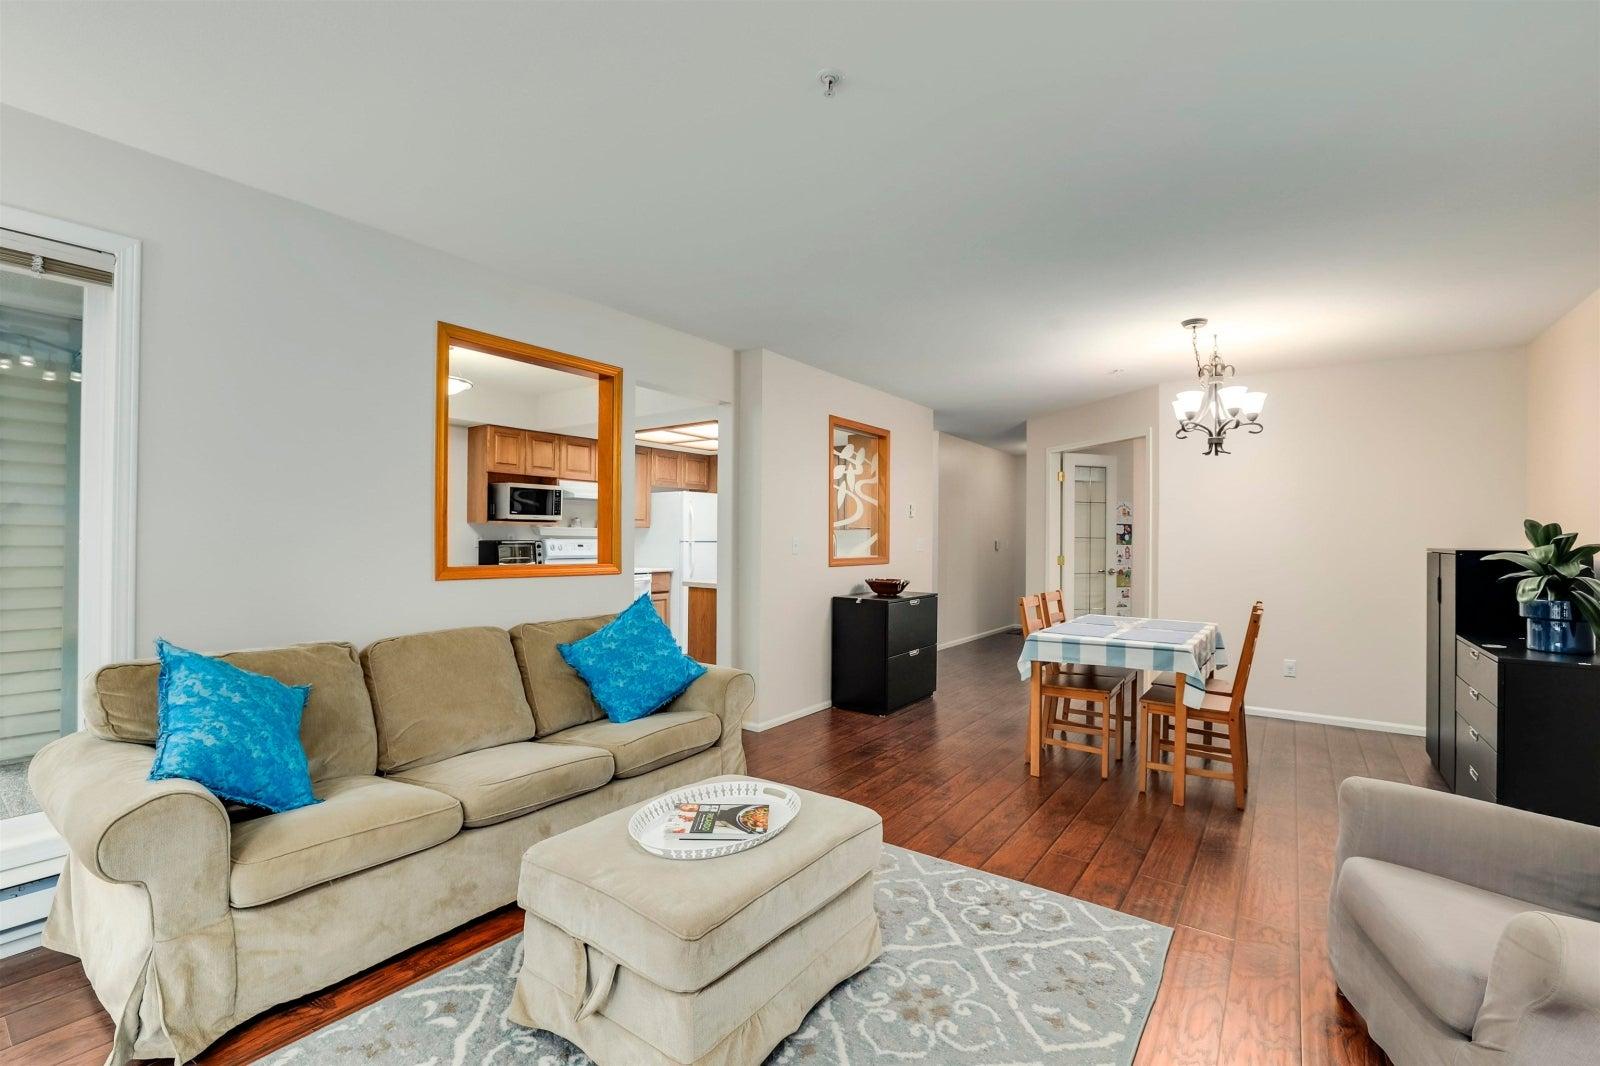 103 1132 DUFFERIN STREET - Eagle Ridge CQ Apartment/Condo for sale, 2 Bedrooms (R2618654) #4